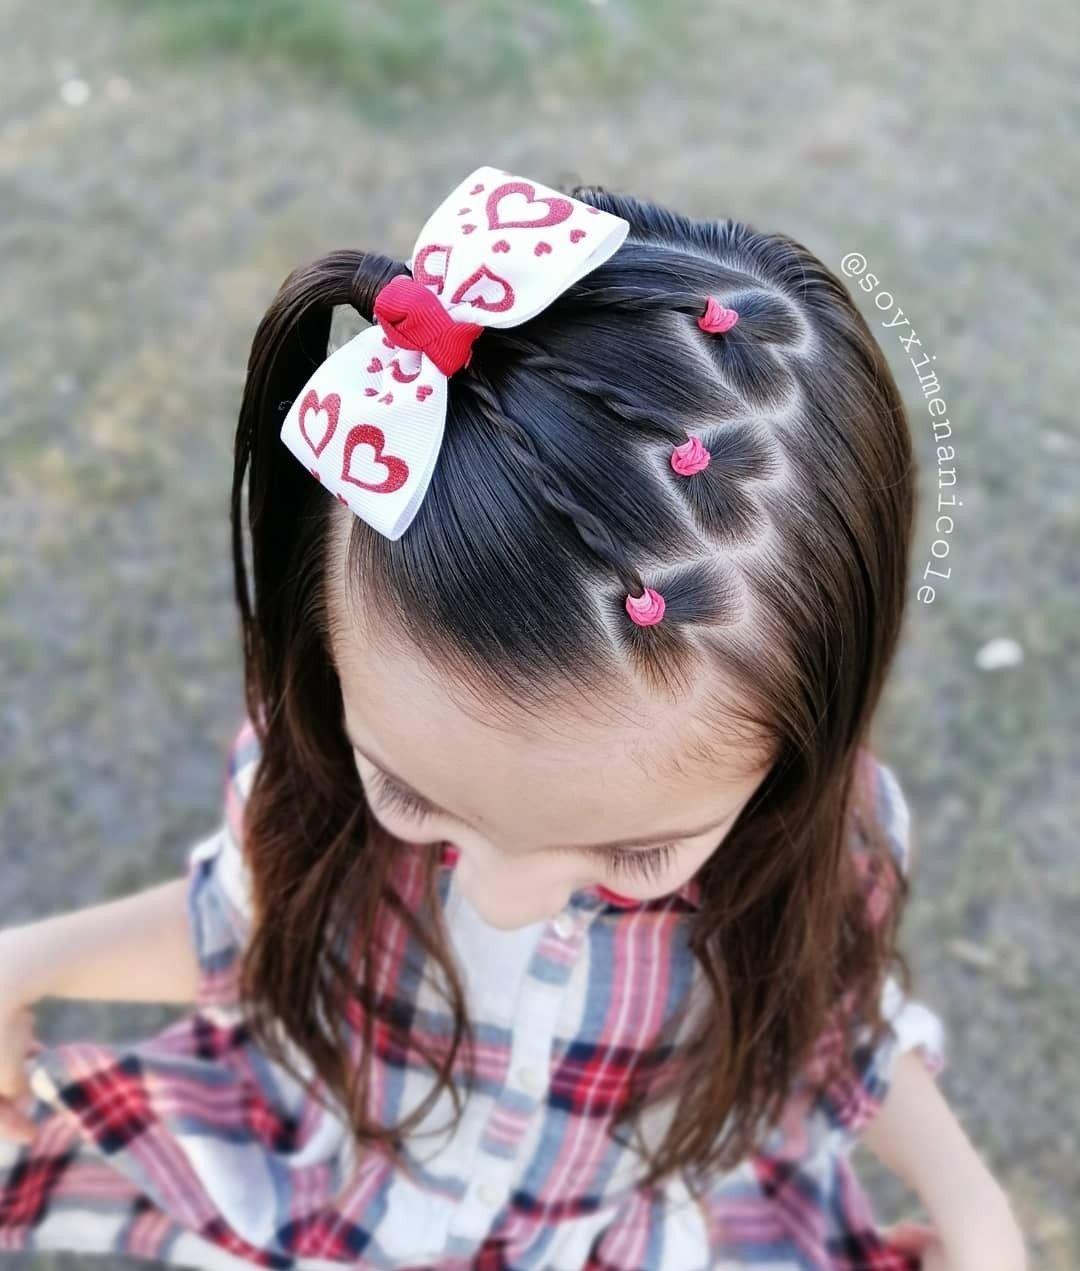 Toddler Hairstyles Girl Hairstyles Girl Hairstyles Toddler Hairstyles Girl girl Hairstyles toddler